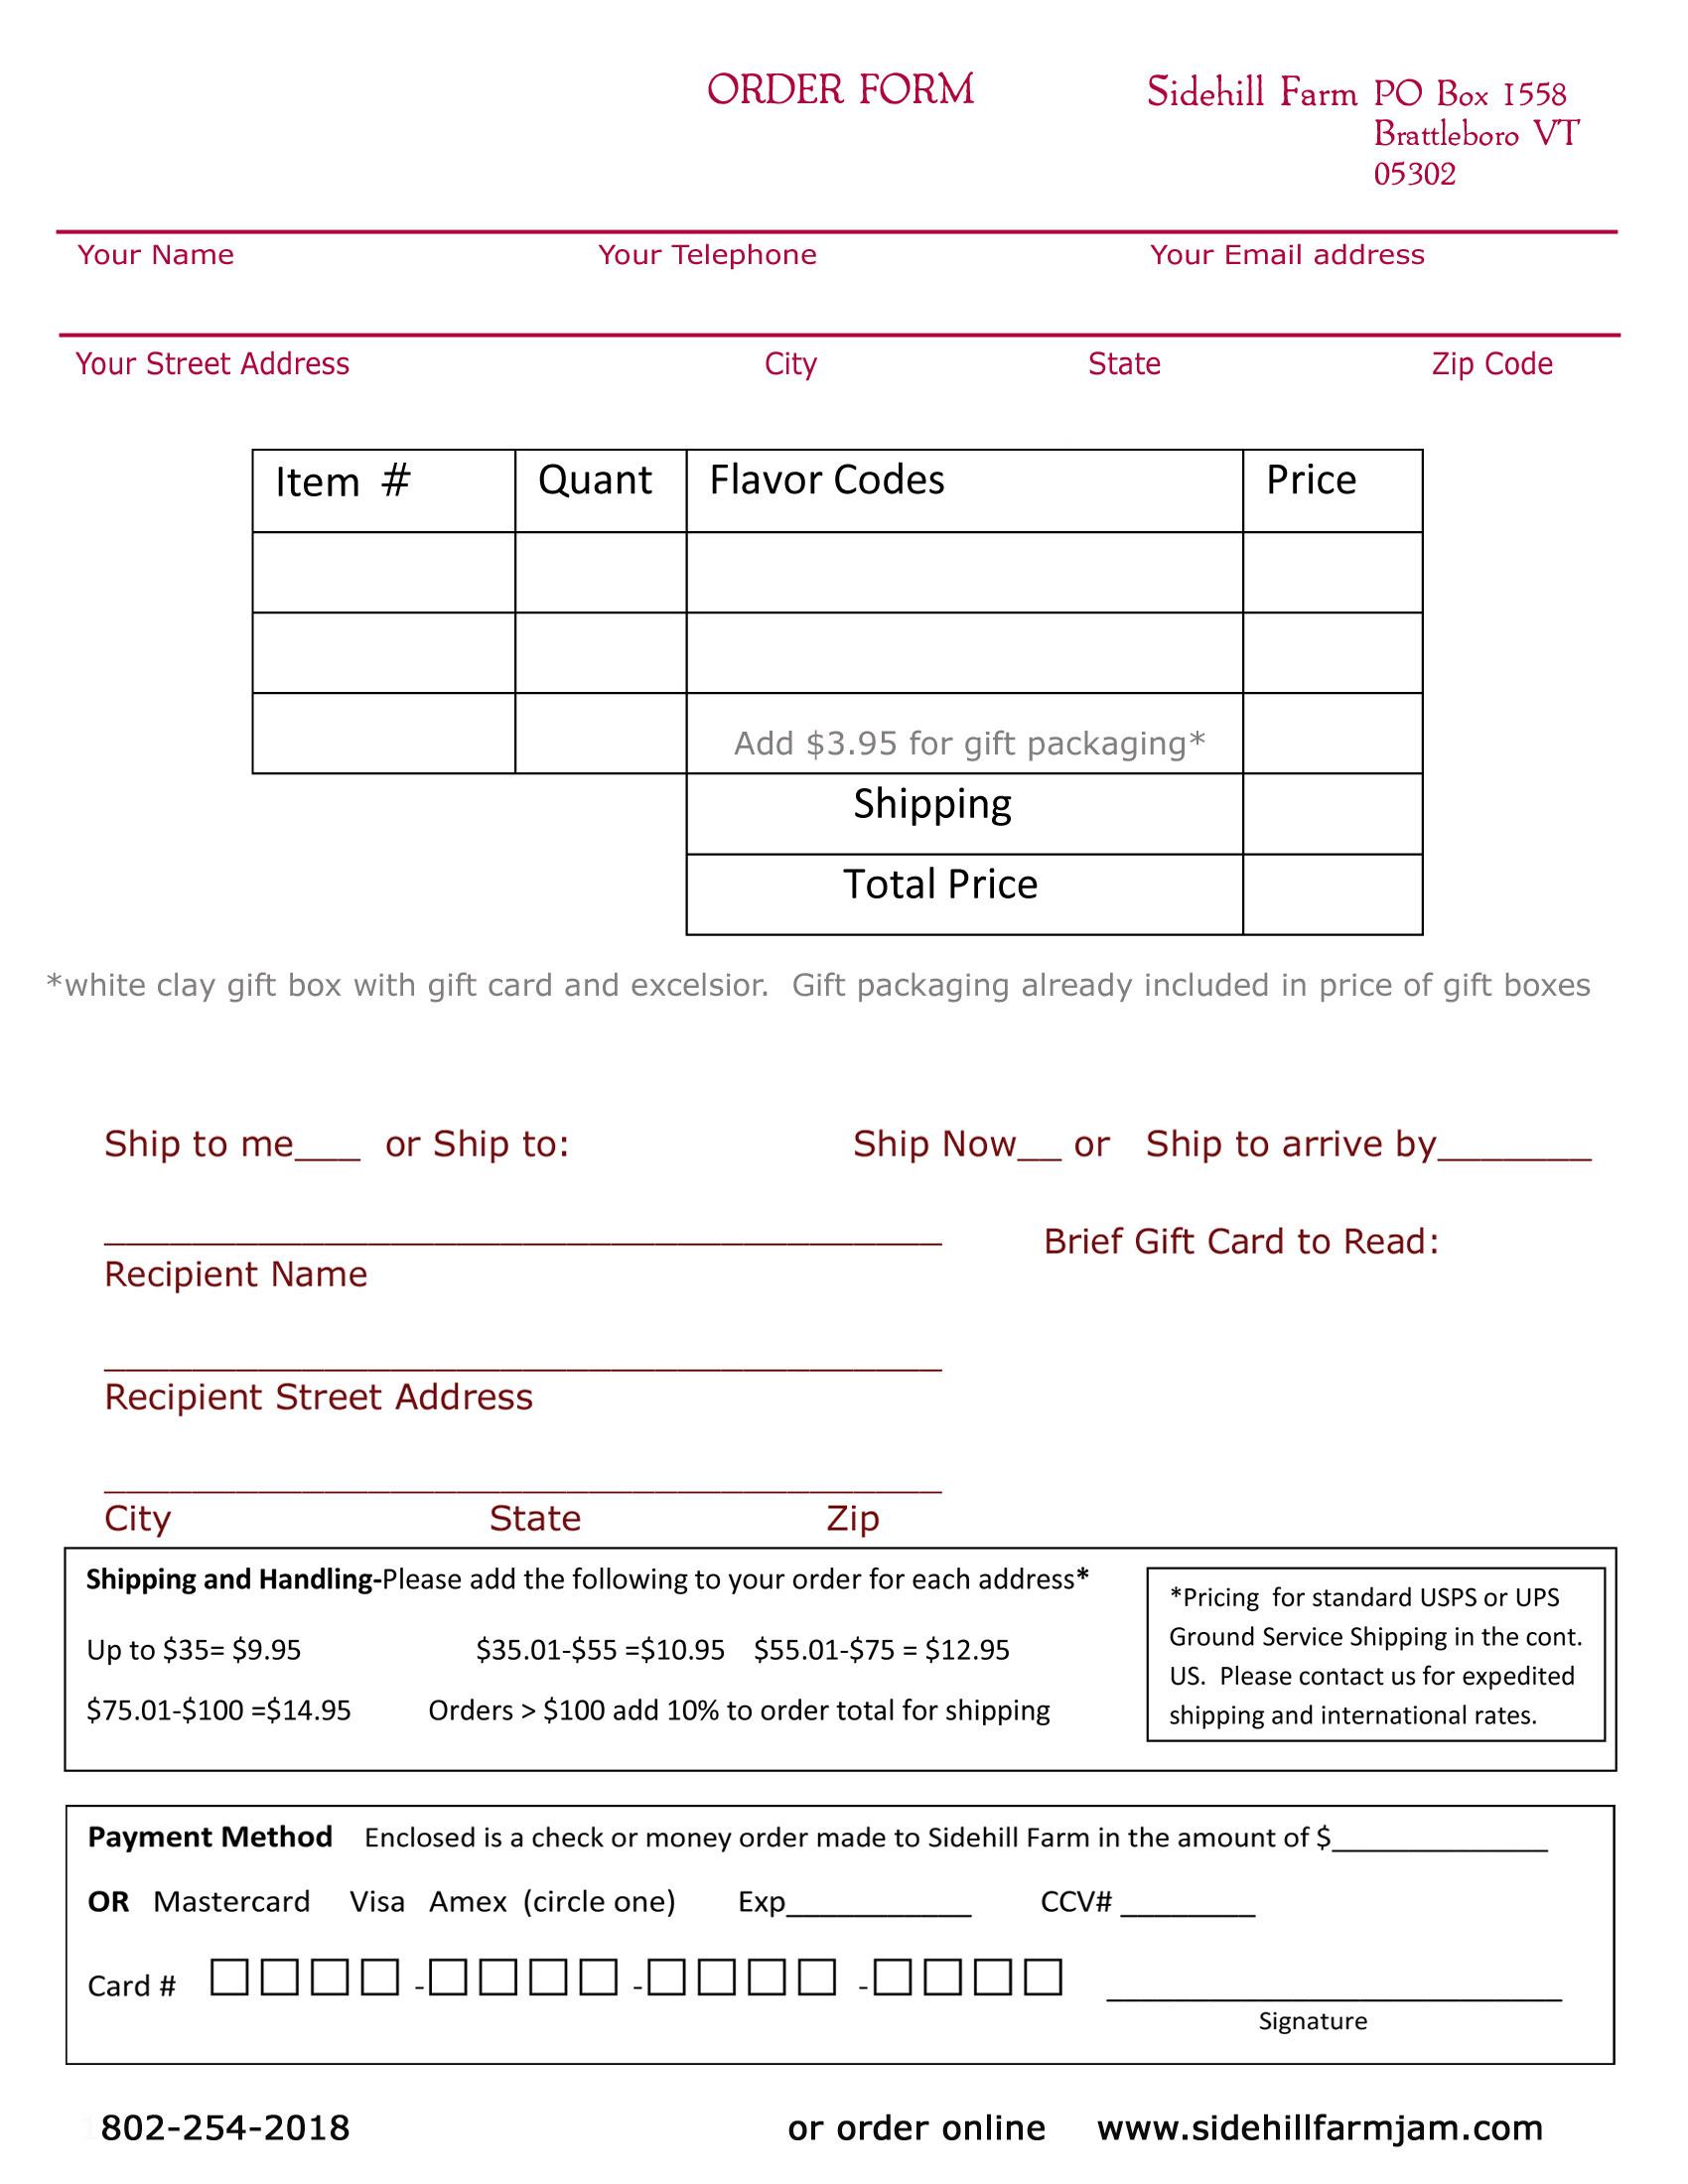 order-form-copy.jpg